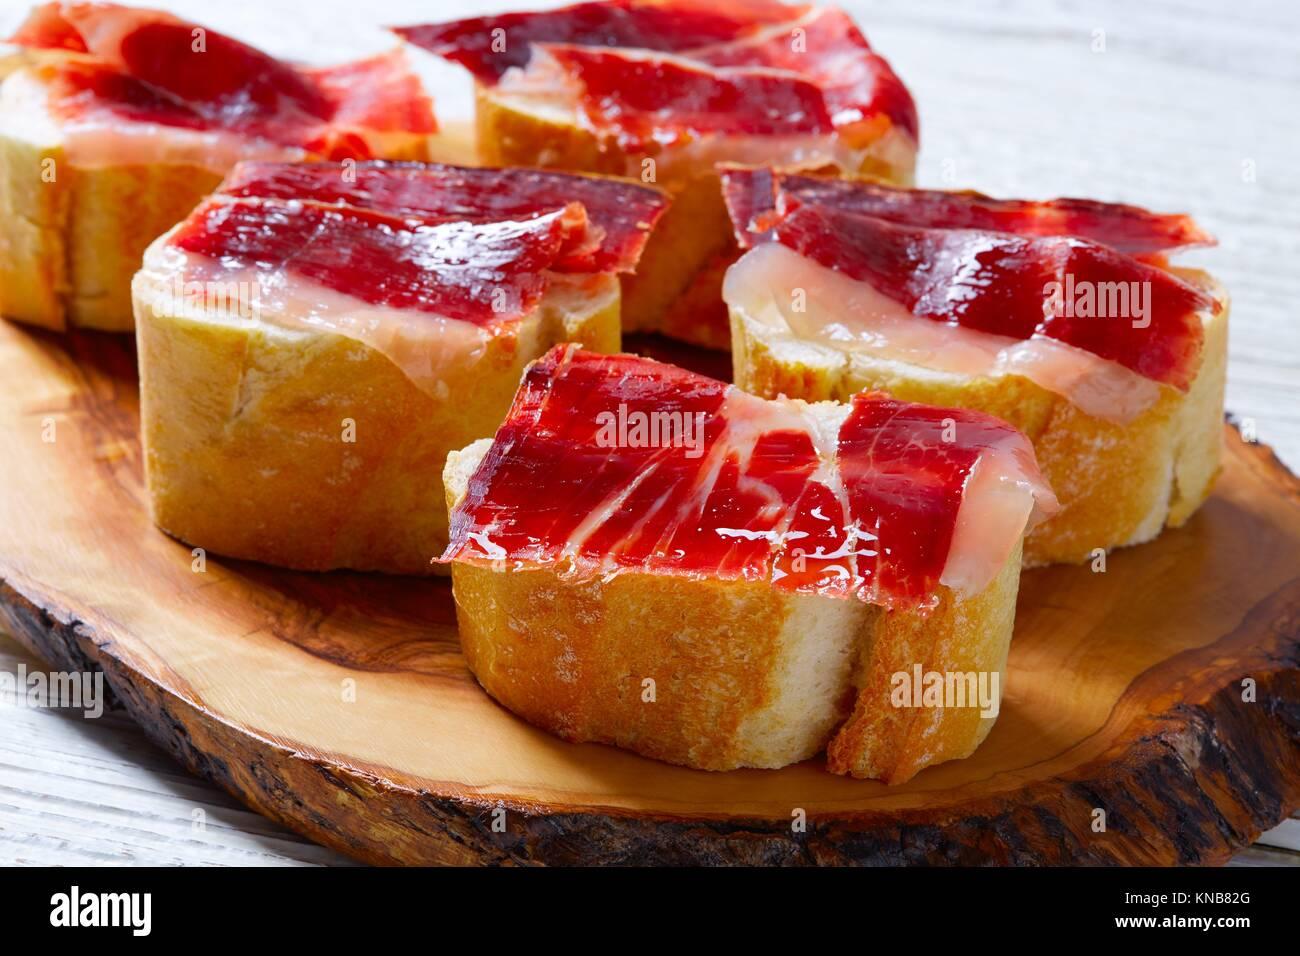 iberian ham from Spain tapas pinchos food recipes. - Stock Image